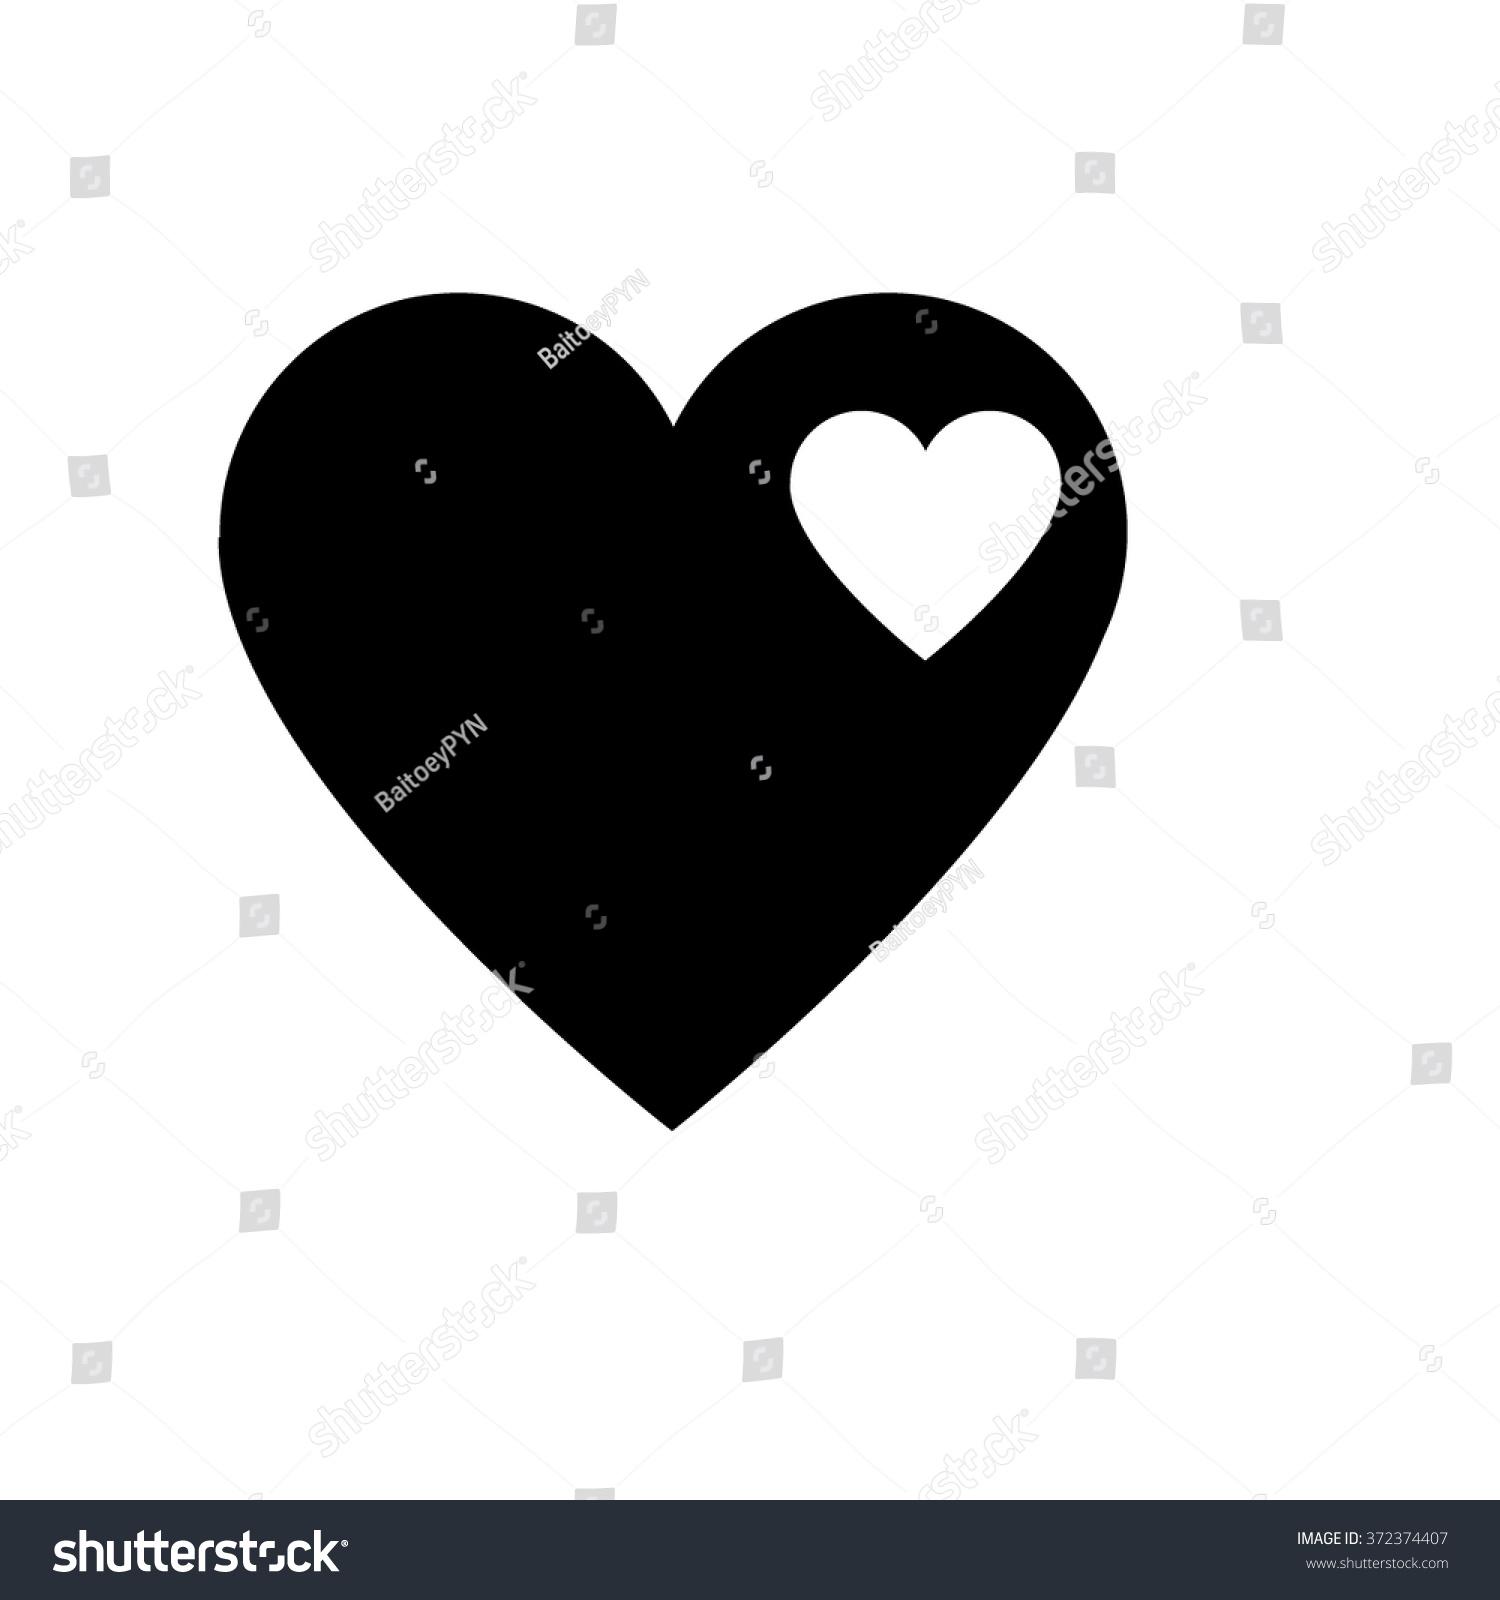 White Small Heart Black Hearts Symbol Stock Vector Royalty Free